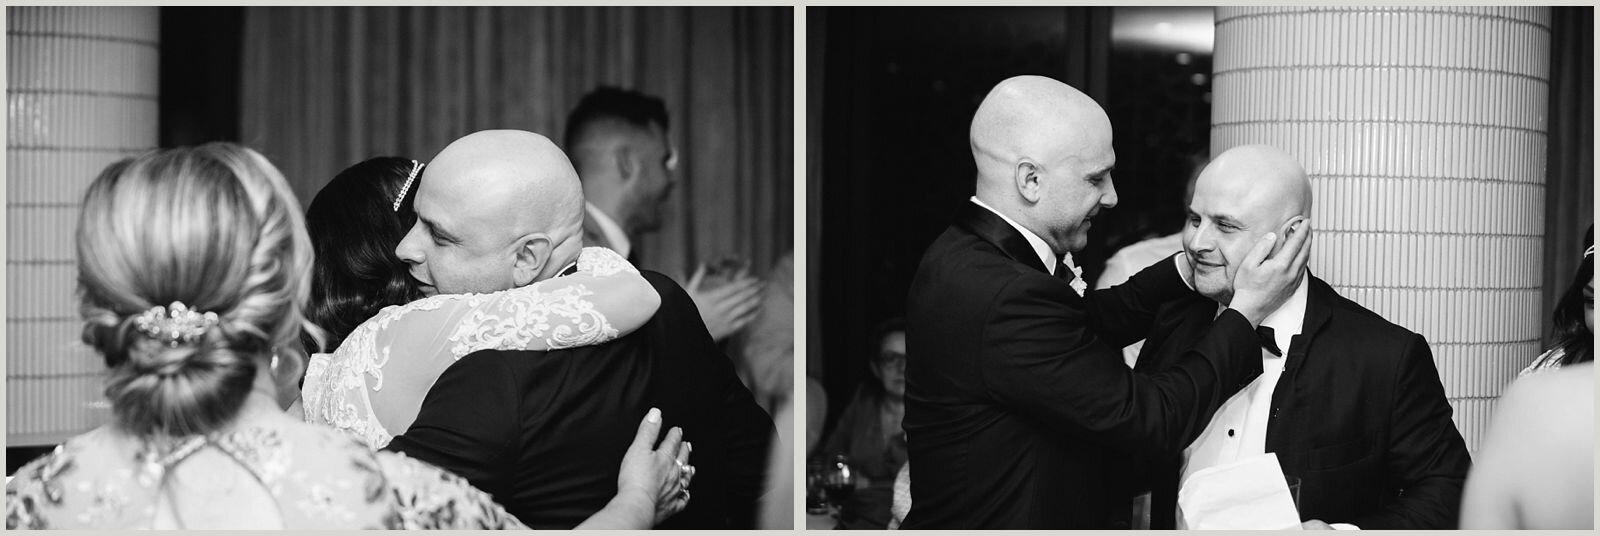 joseph_koprek_wedding_melbourne_the_prince_deck_0092.jpg